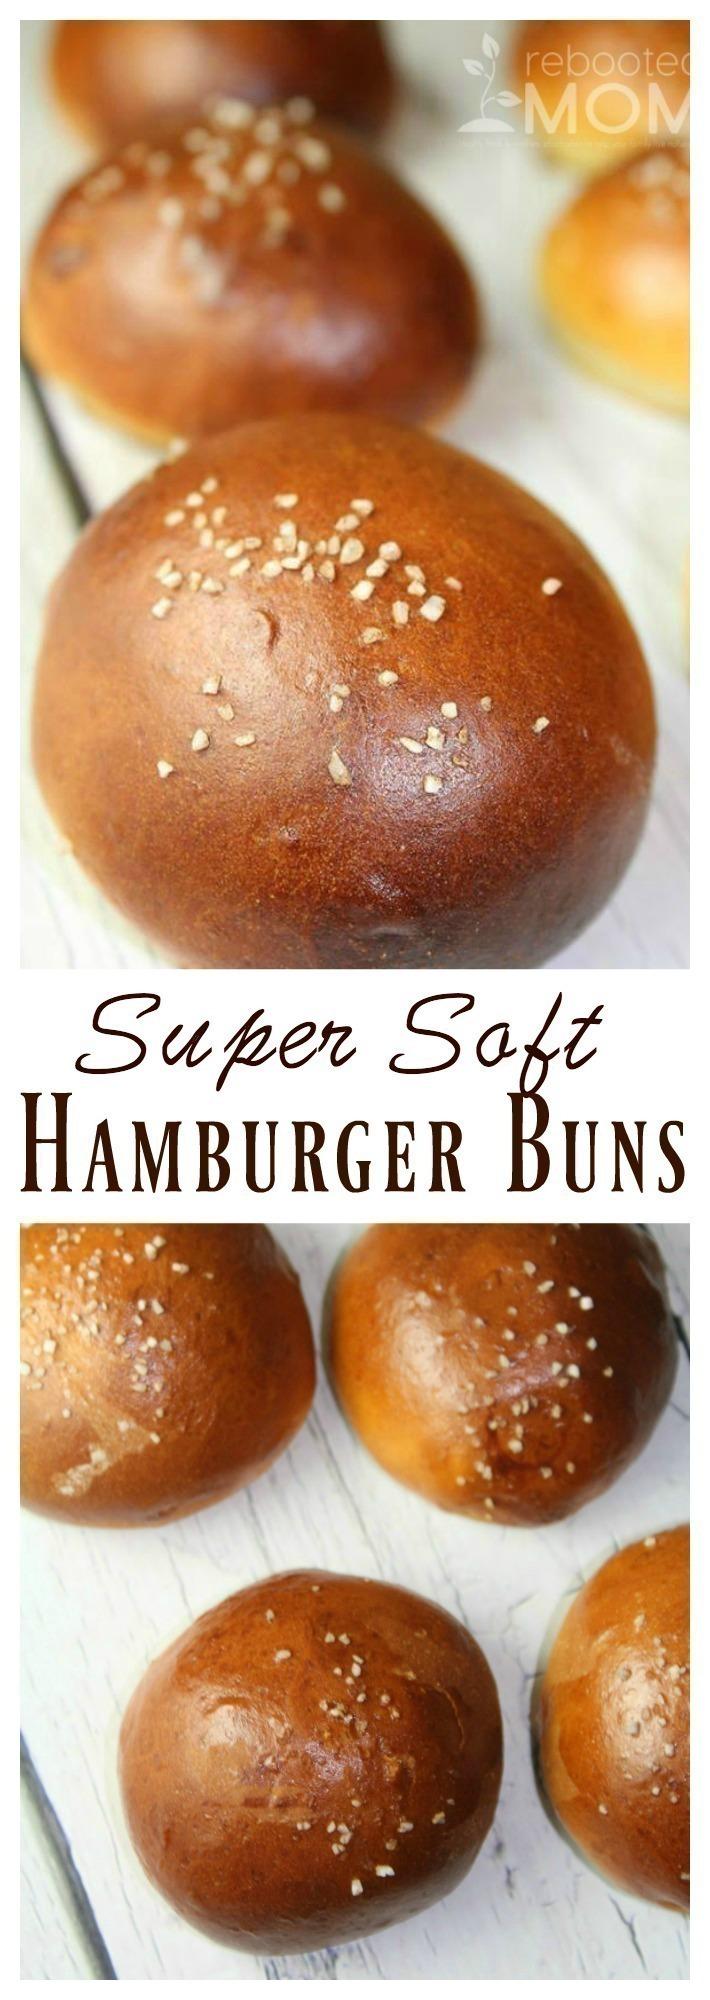 Super Soft Hamburger Buns (ONLY 45 minutes!)